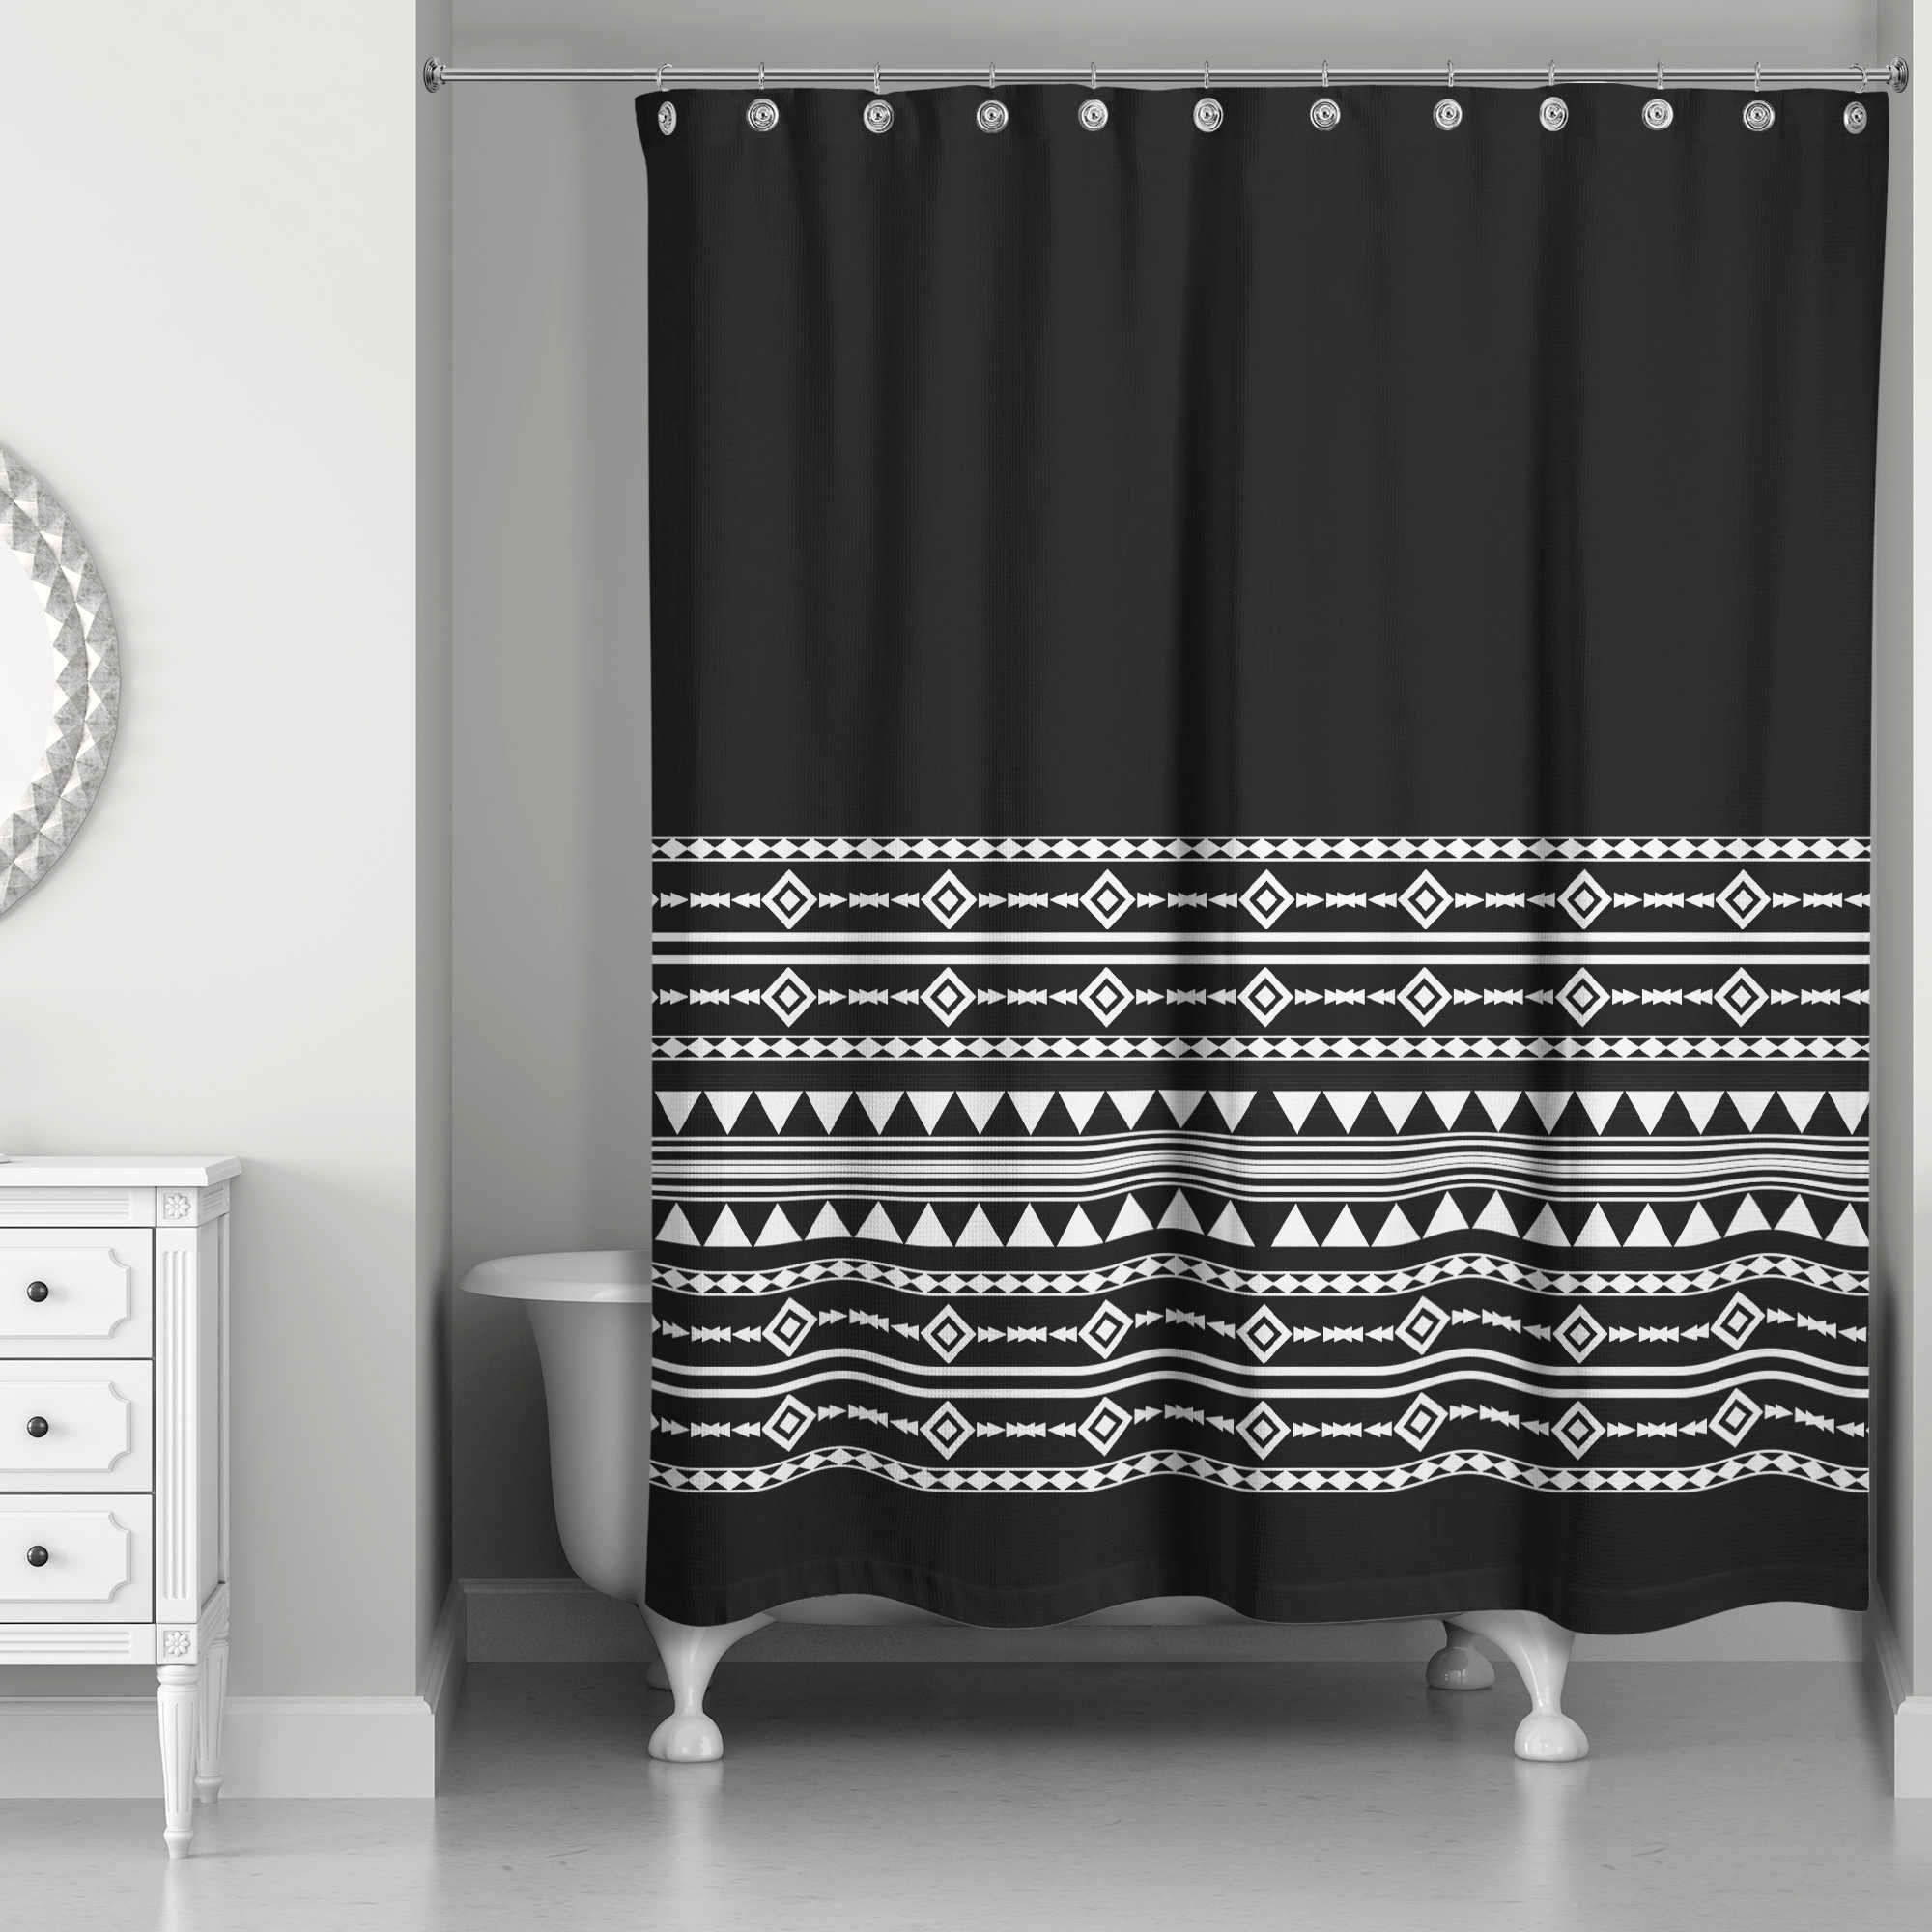 Boho Tribal Shower Curtain In Black White Black Shower Curtains